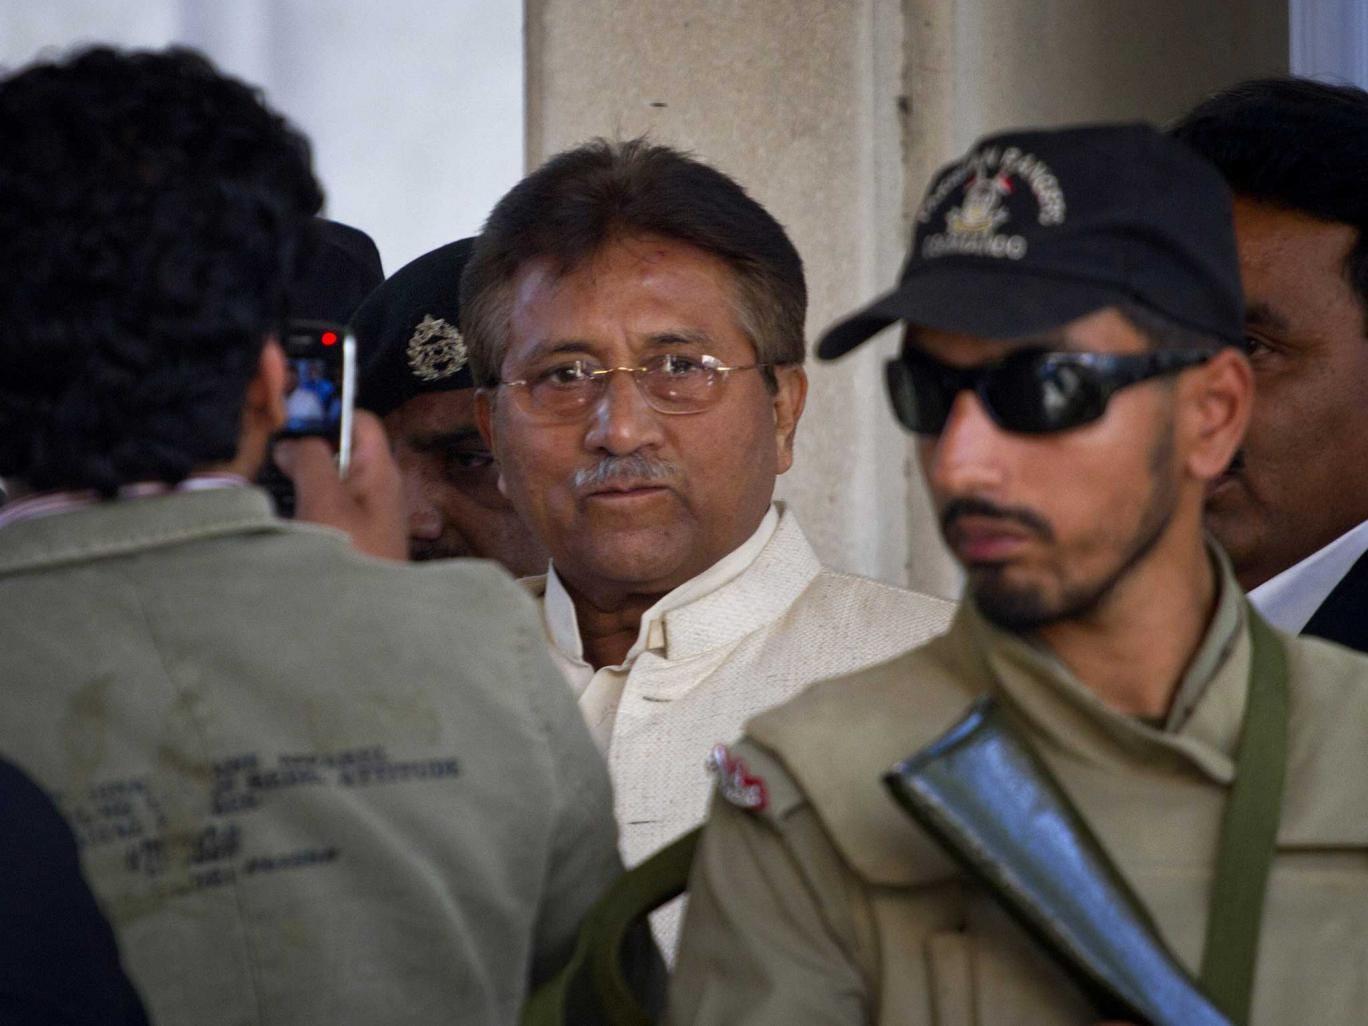 Pakistan's former president and military ruler Pervez Musharraf, centre, leaves court